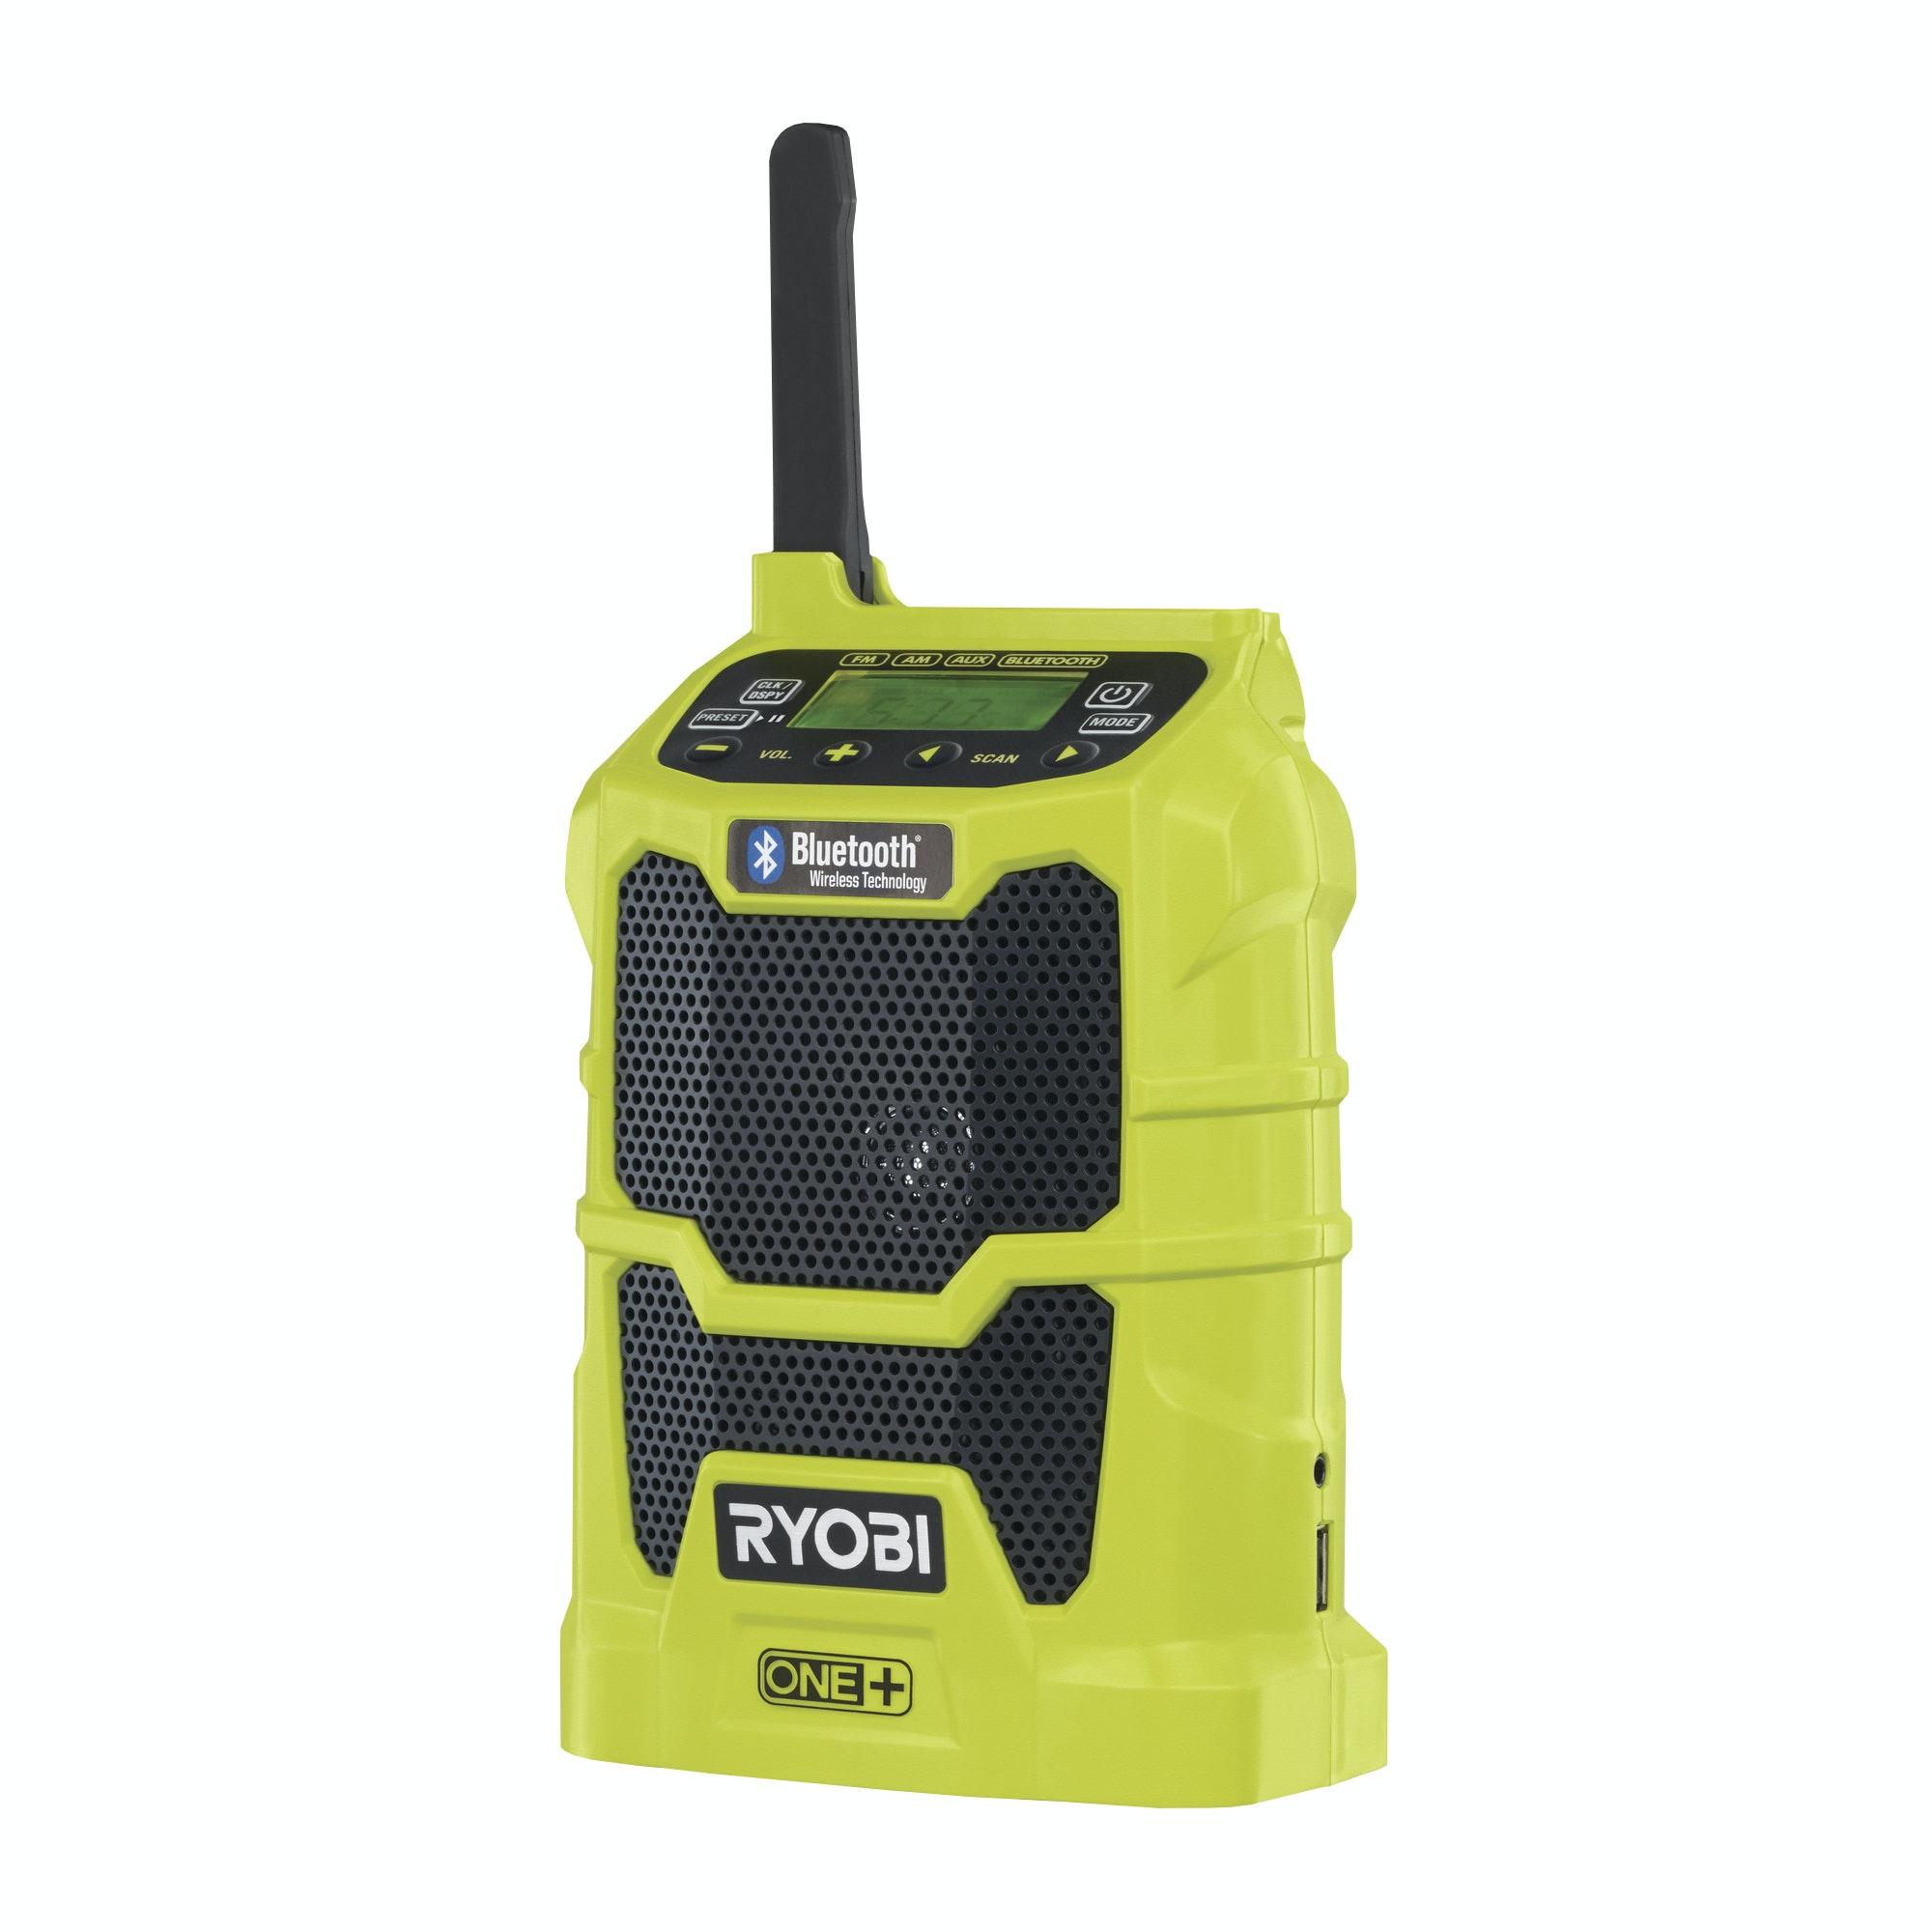 Radio Ryobi R18R-0 18V One+ Bluetooth